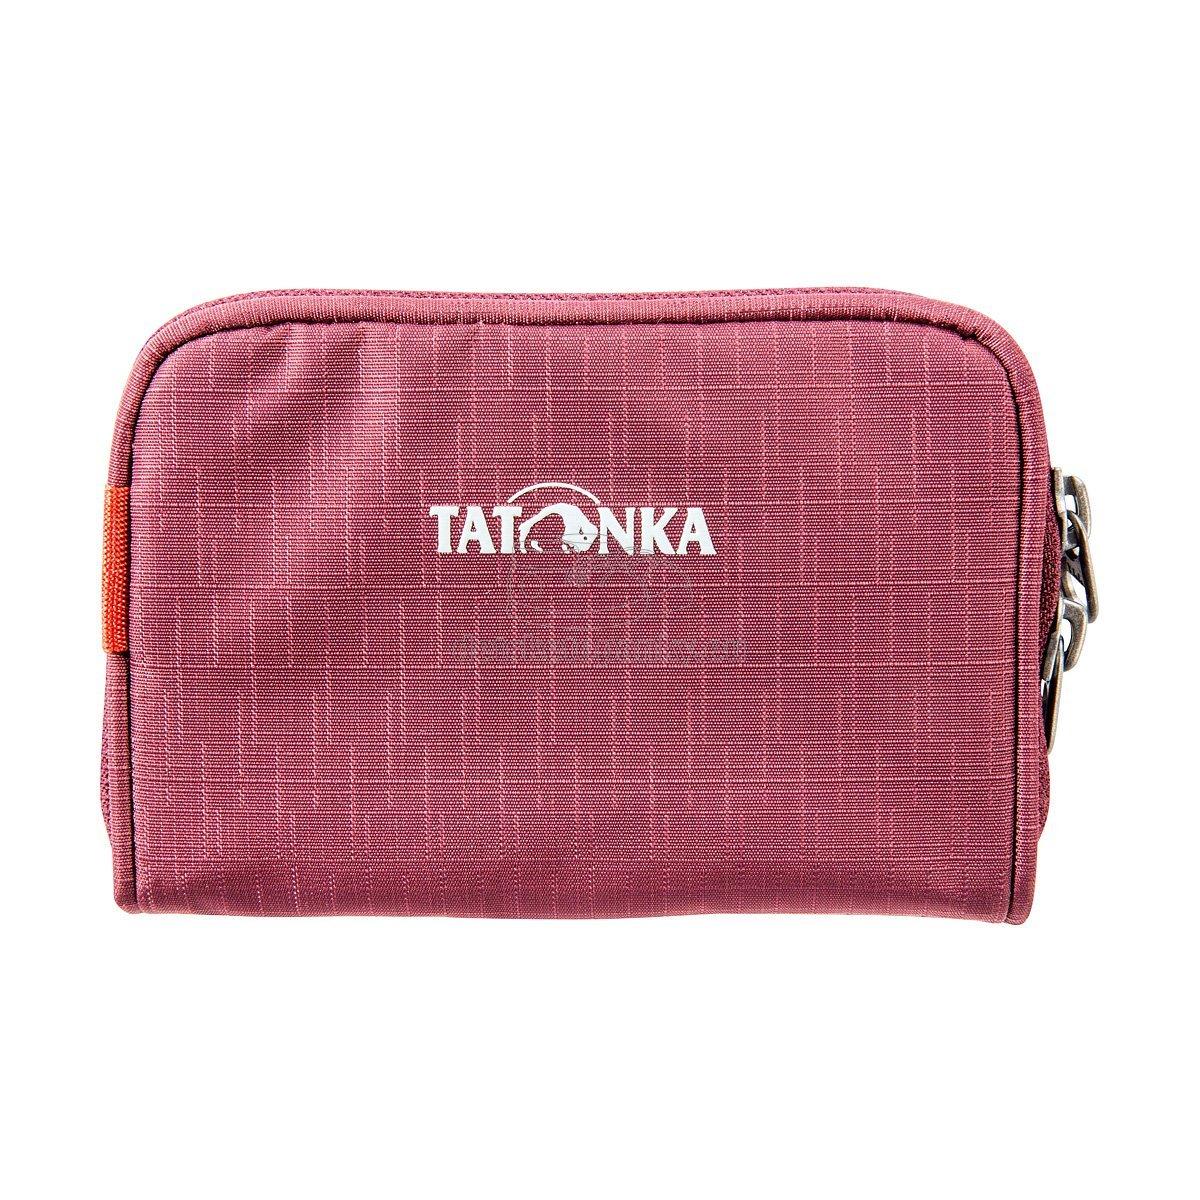 Tatonka Big Plain Wallet (bordeaux red)